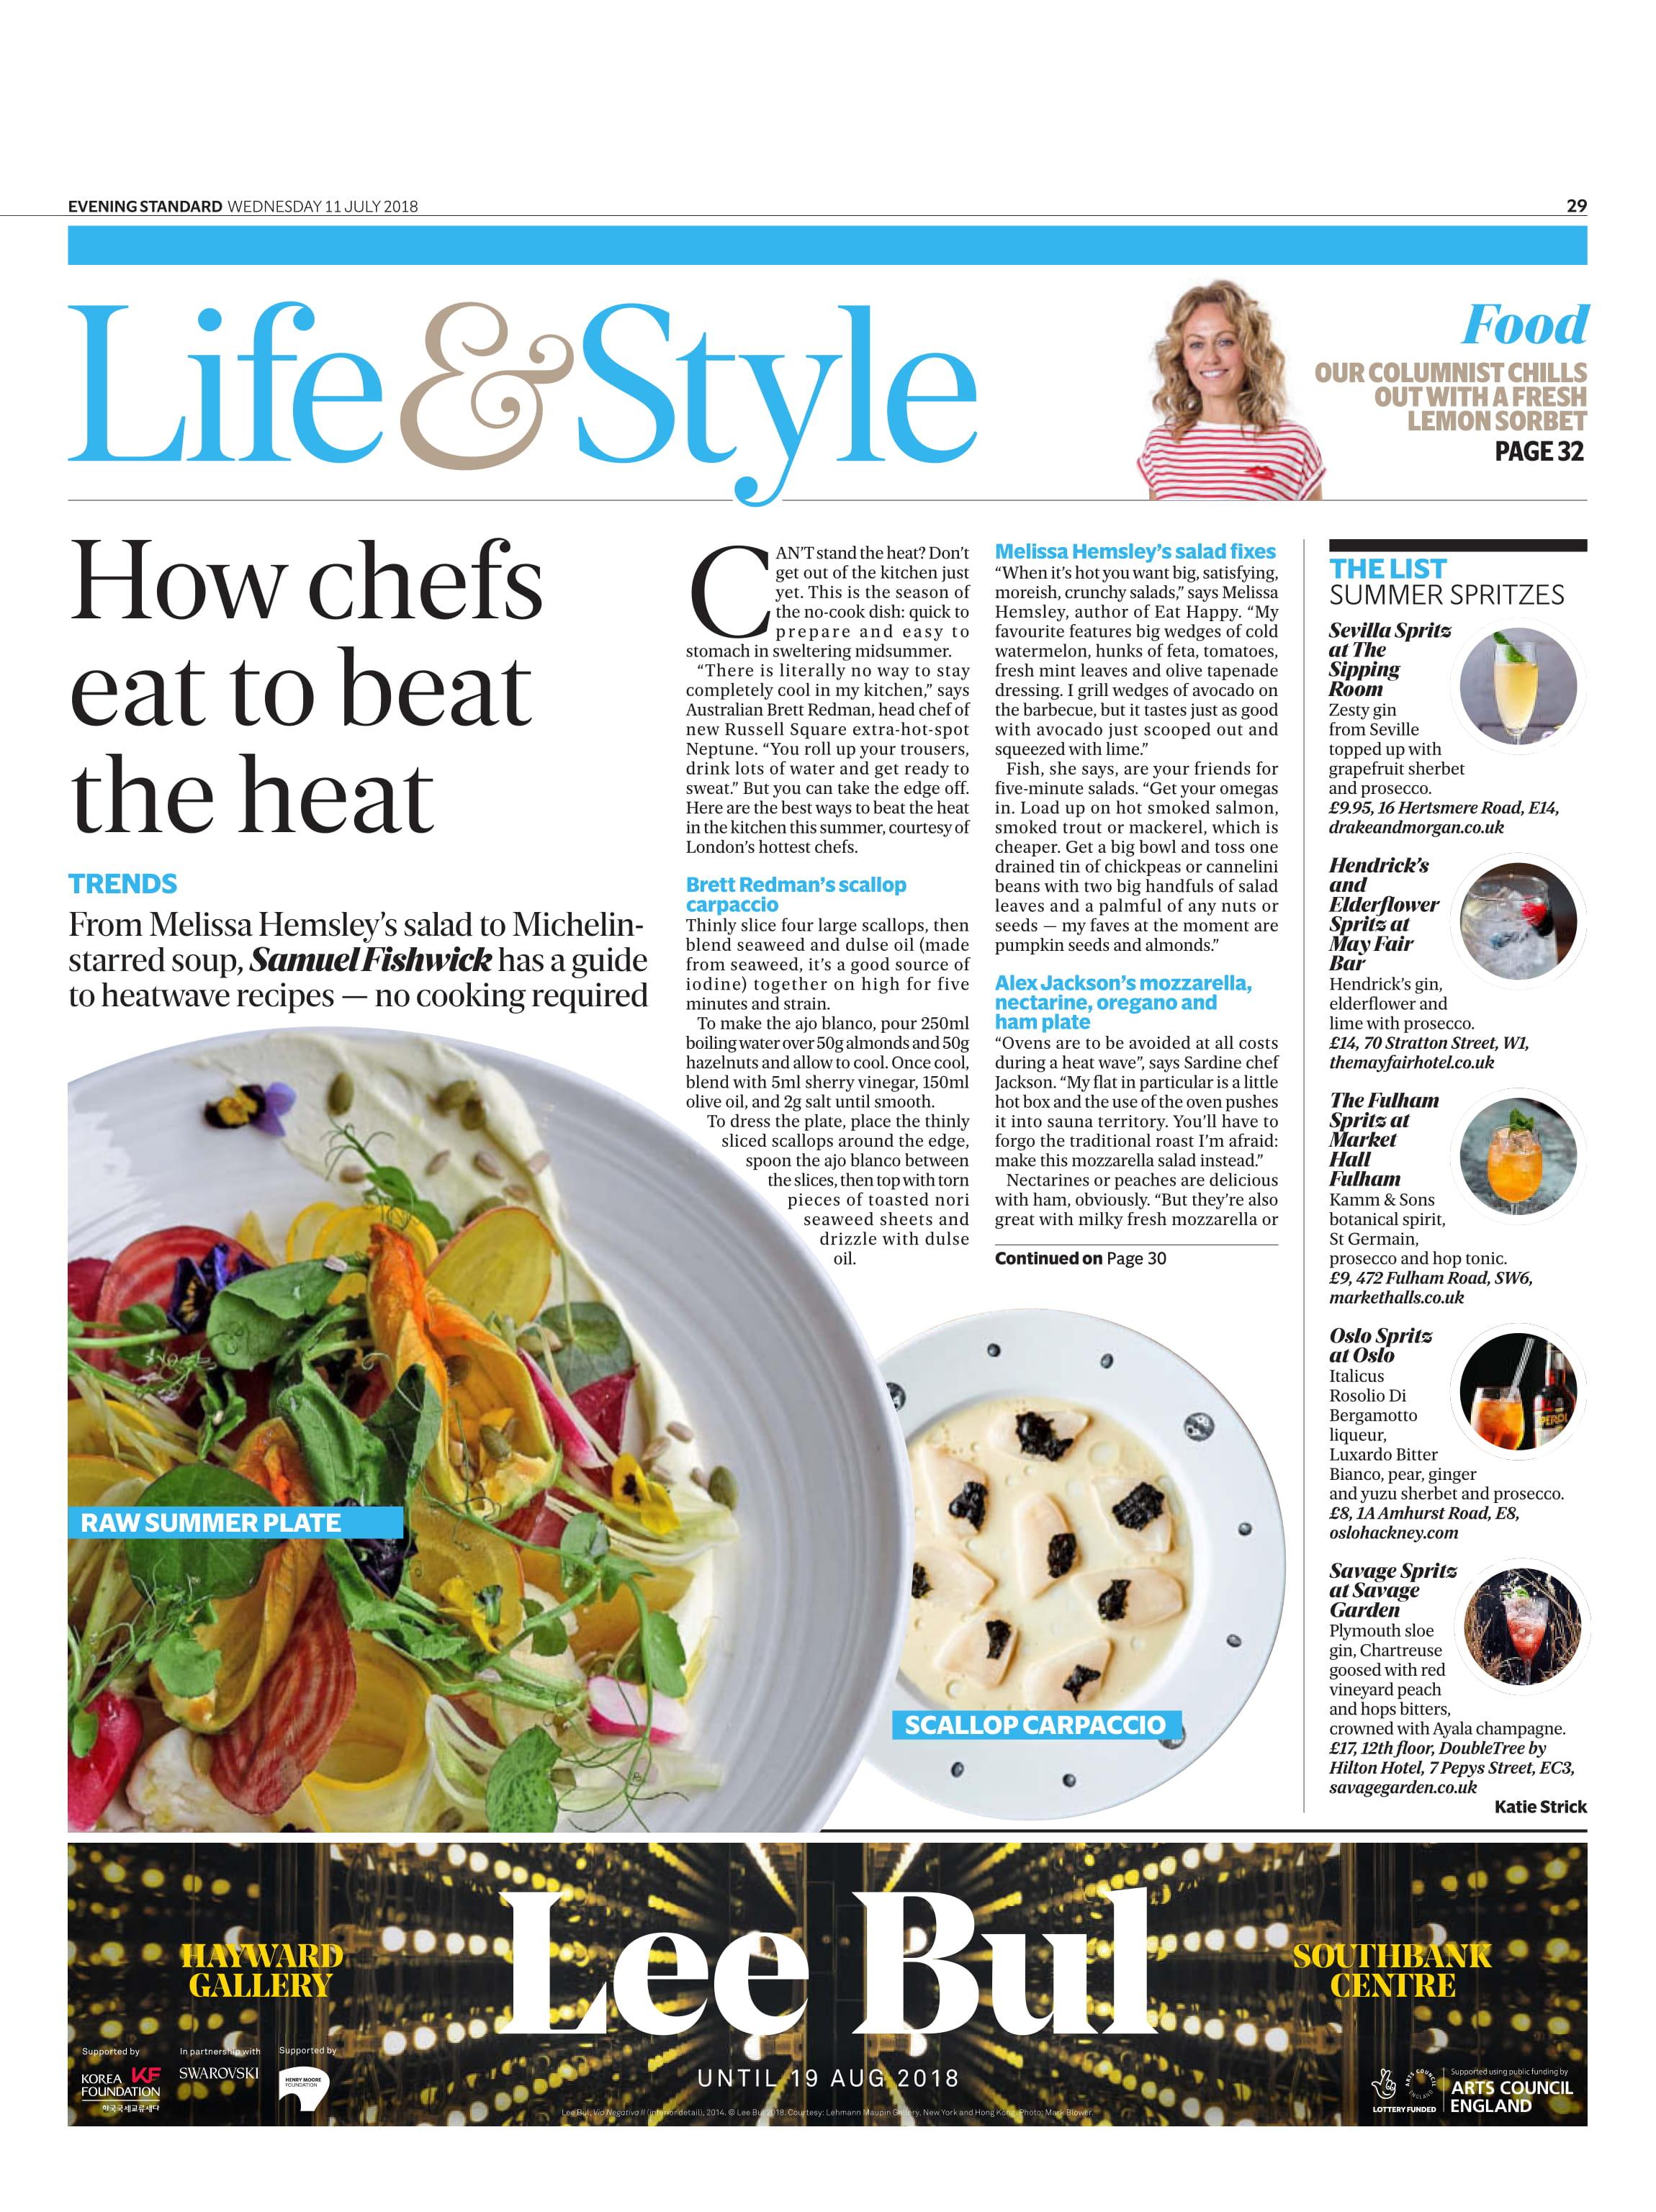 Evening Standard - OSLO - Feature - July 2018-1 (1).jpg